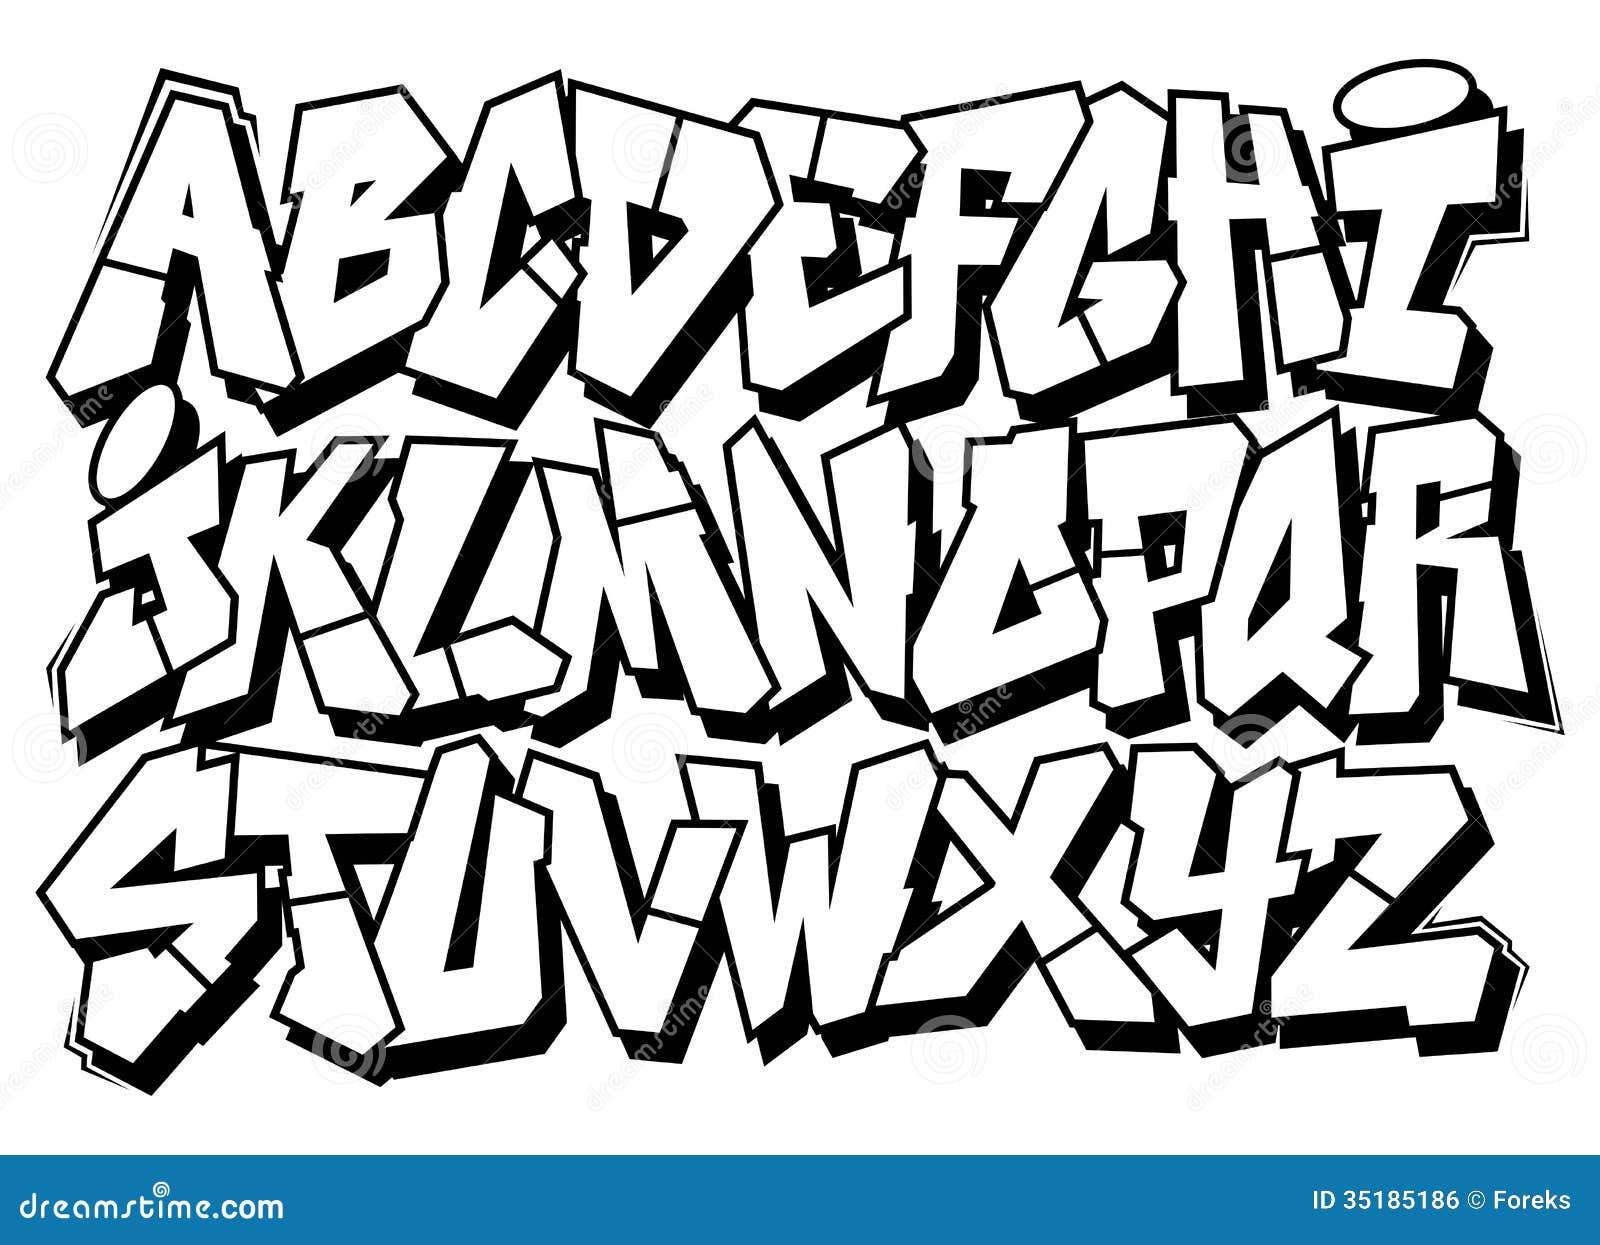 Type Classique Alphabet De Police De Graffiti D'art De Rue Image libre ...: fr.dreamstime.com/image-libre-de-droits-type-classique-alphabet-de...